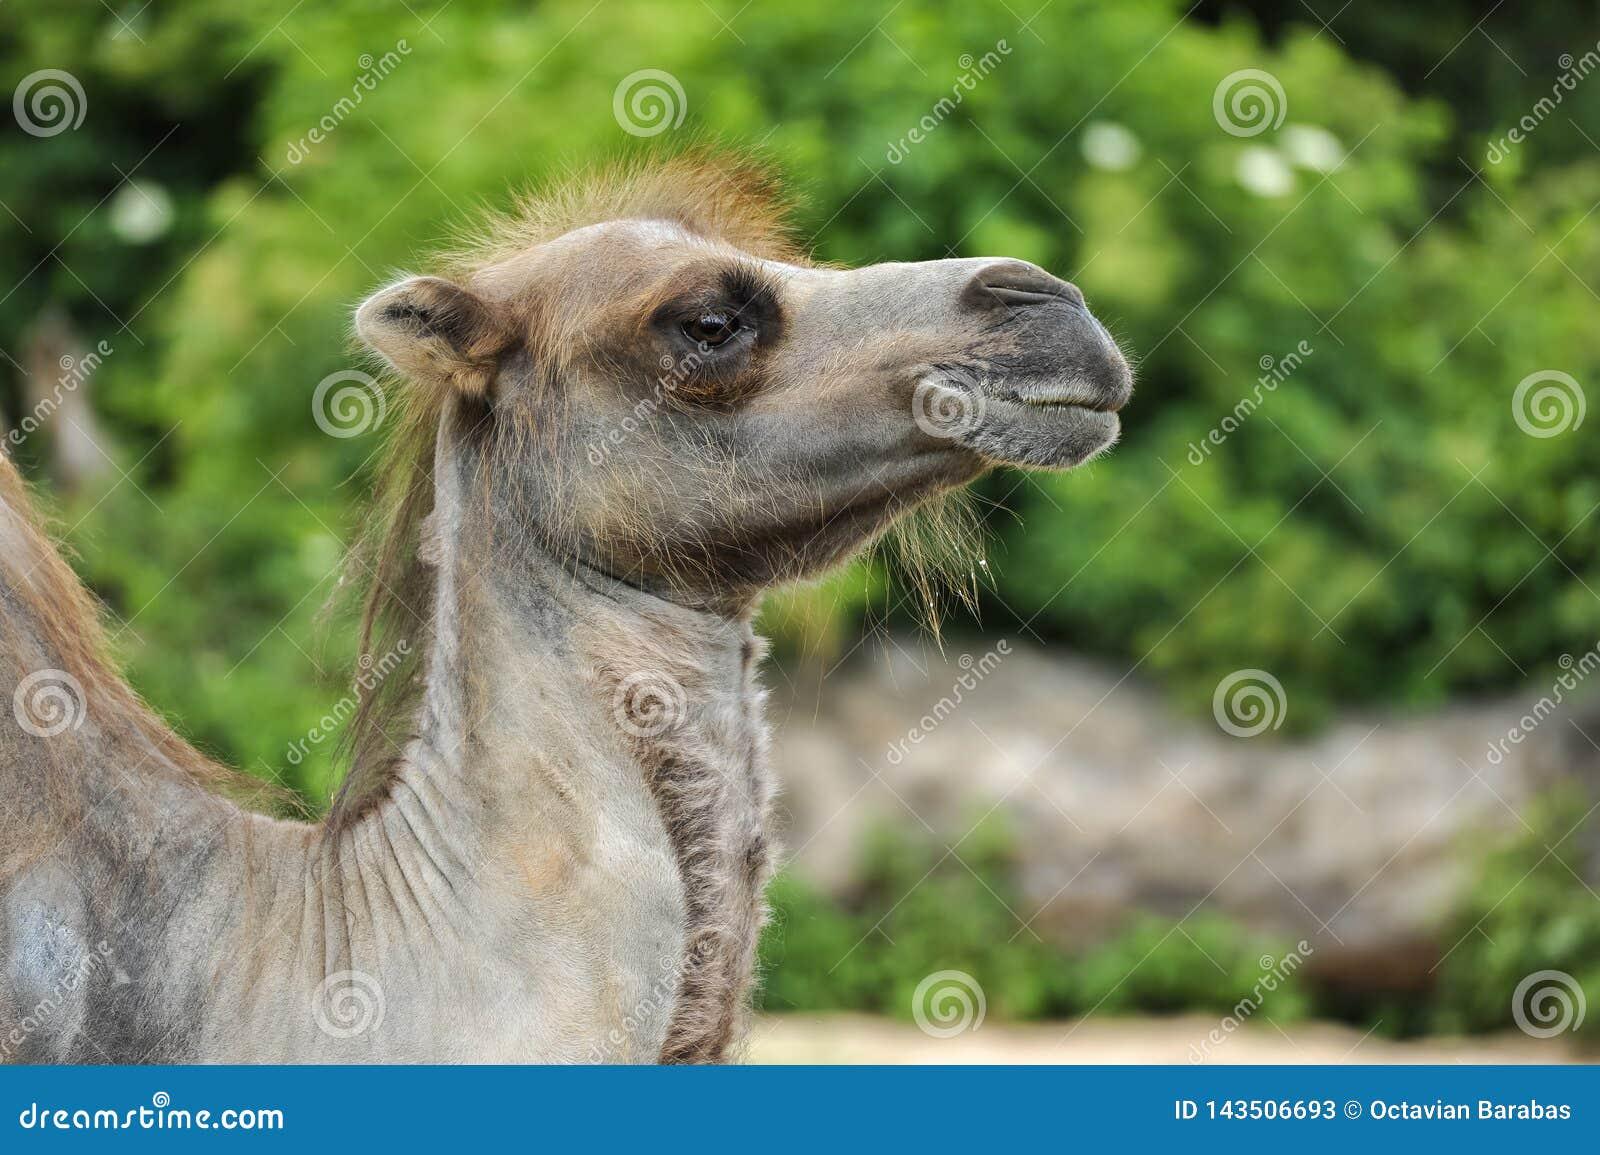 Perfil de un camello melenudo en la vegetación verde